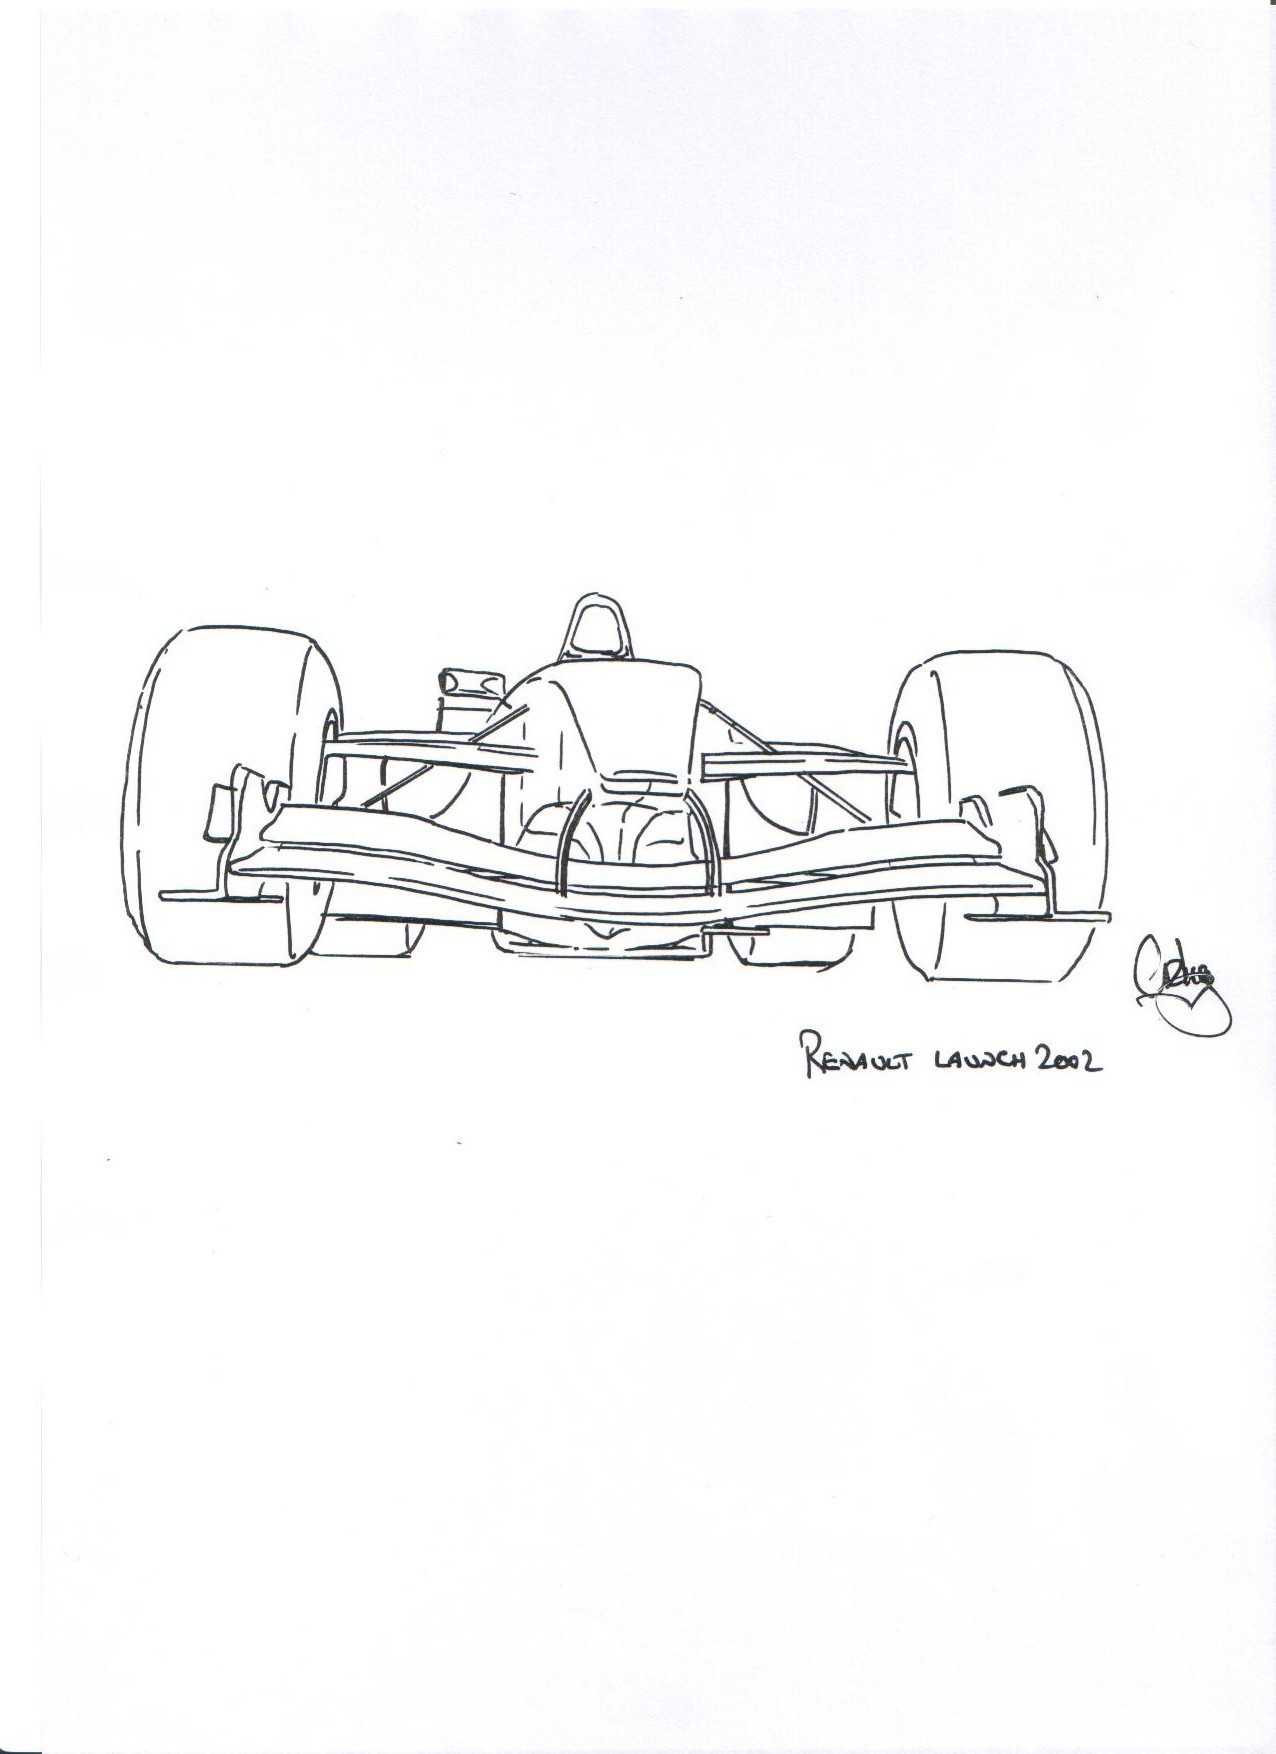 renault rear end